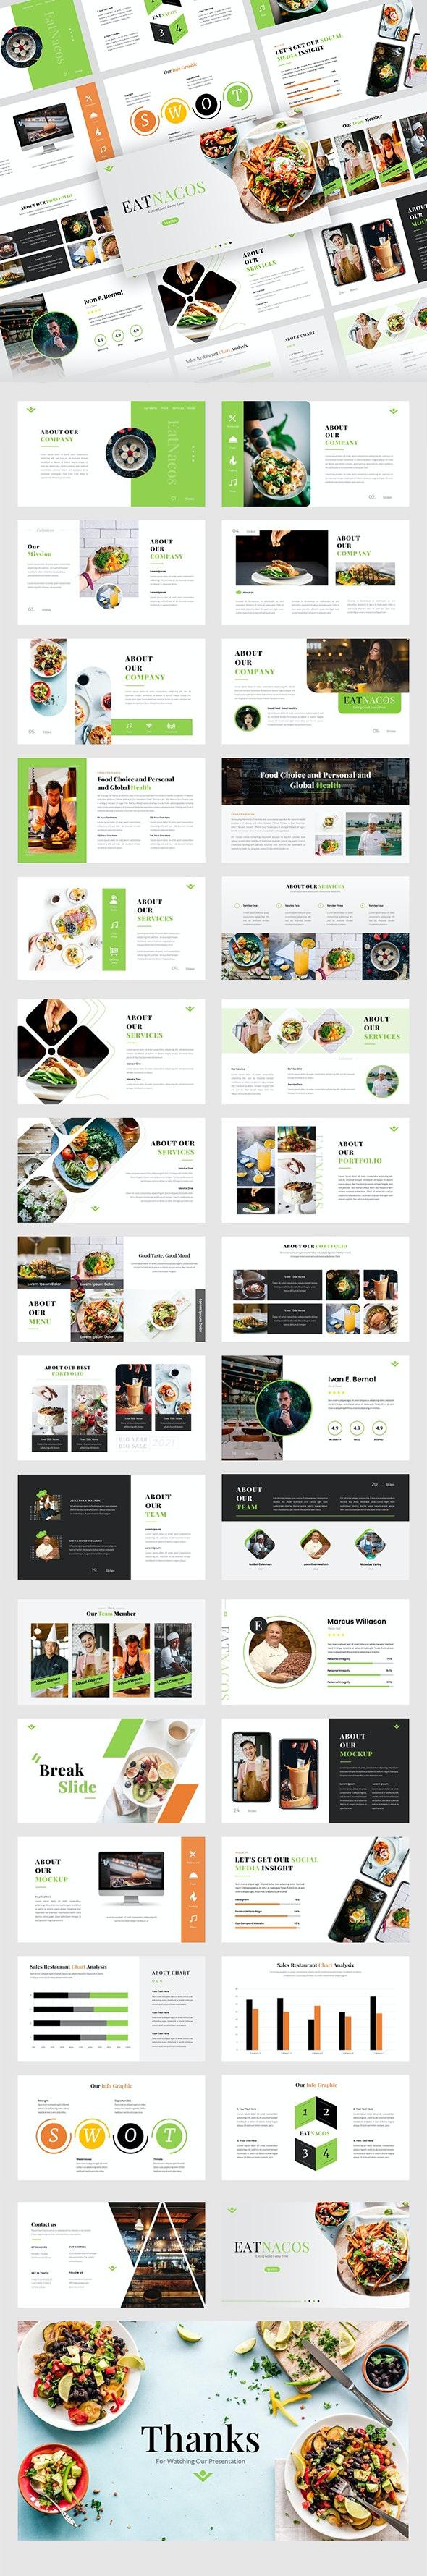 Eatnacos-Food Powerpoint Presentation Template - Business PowerPoint Templates